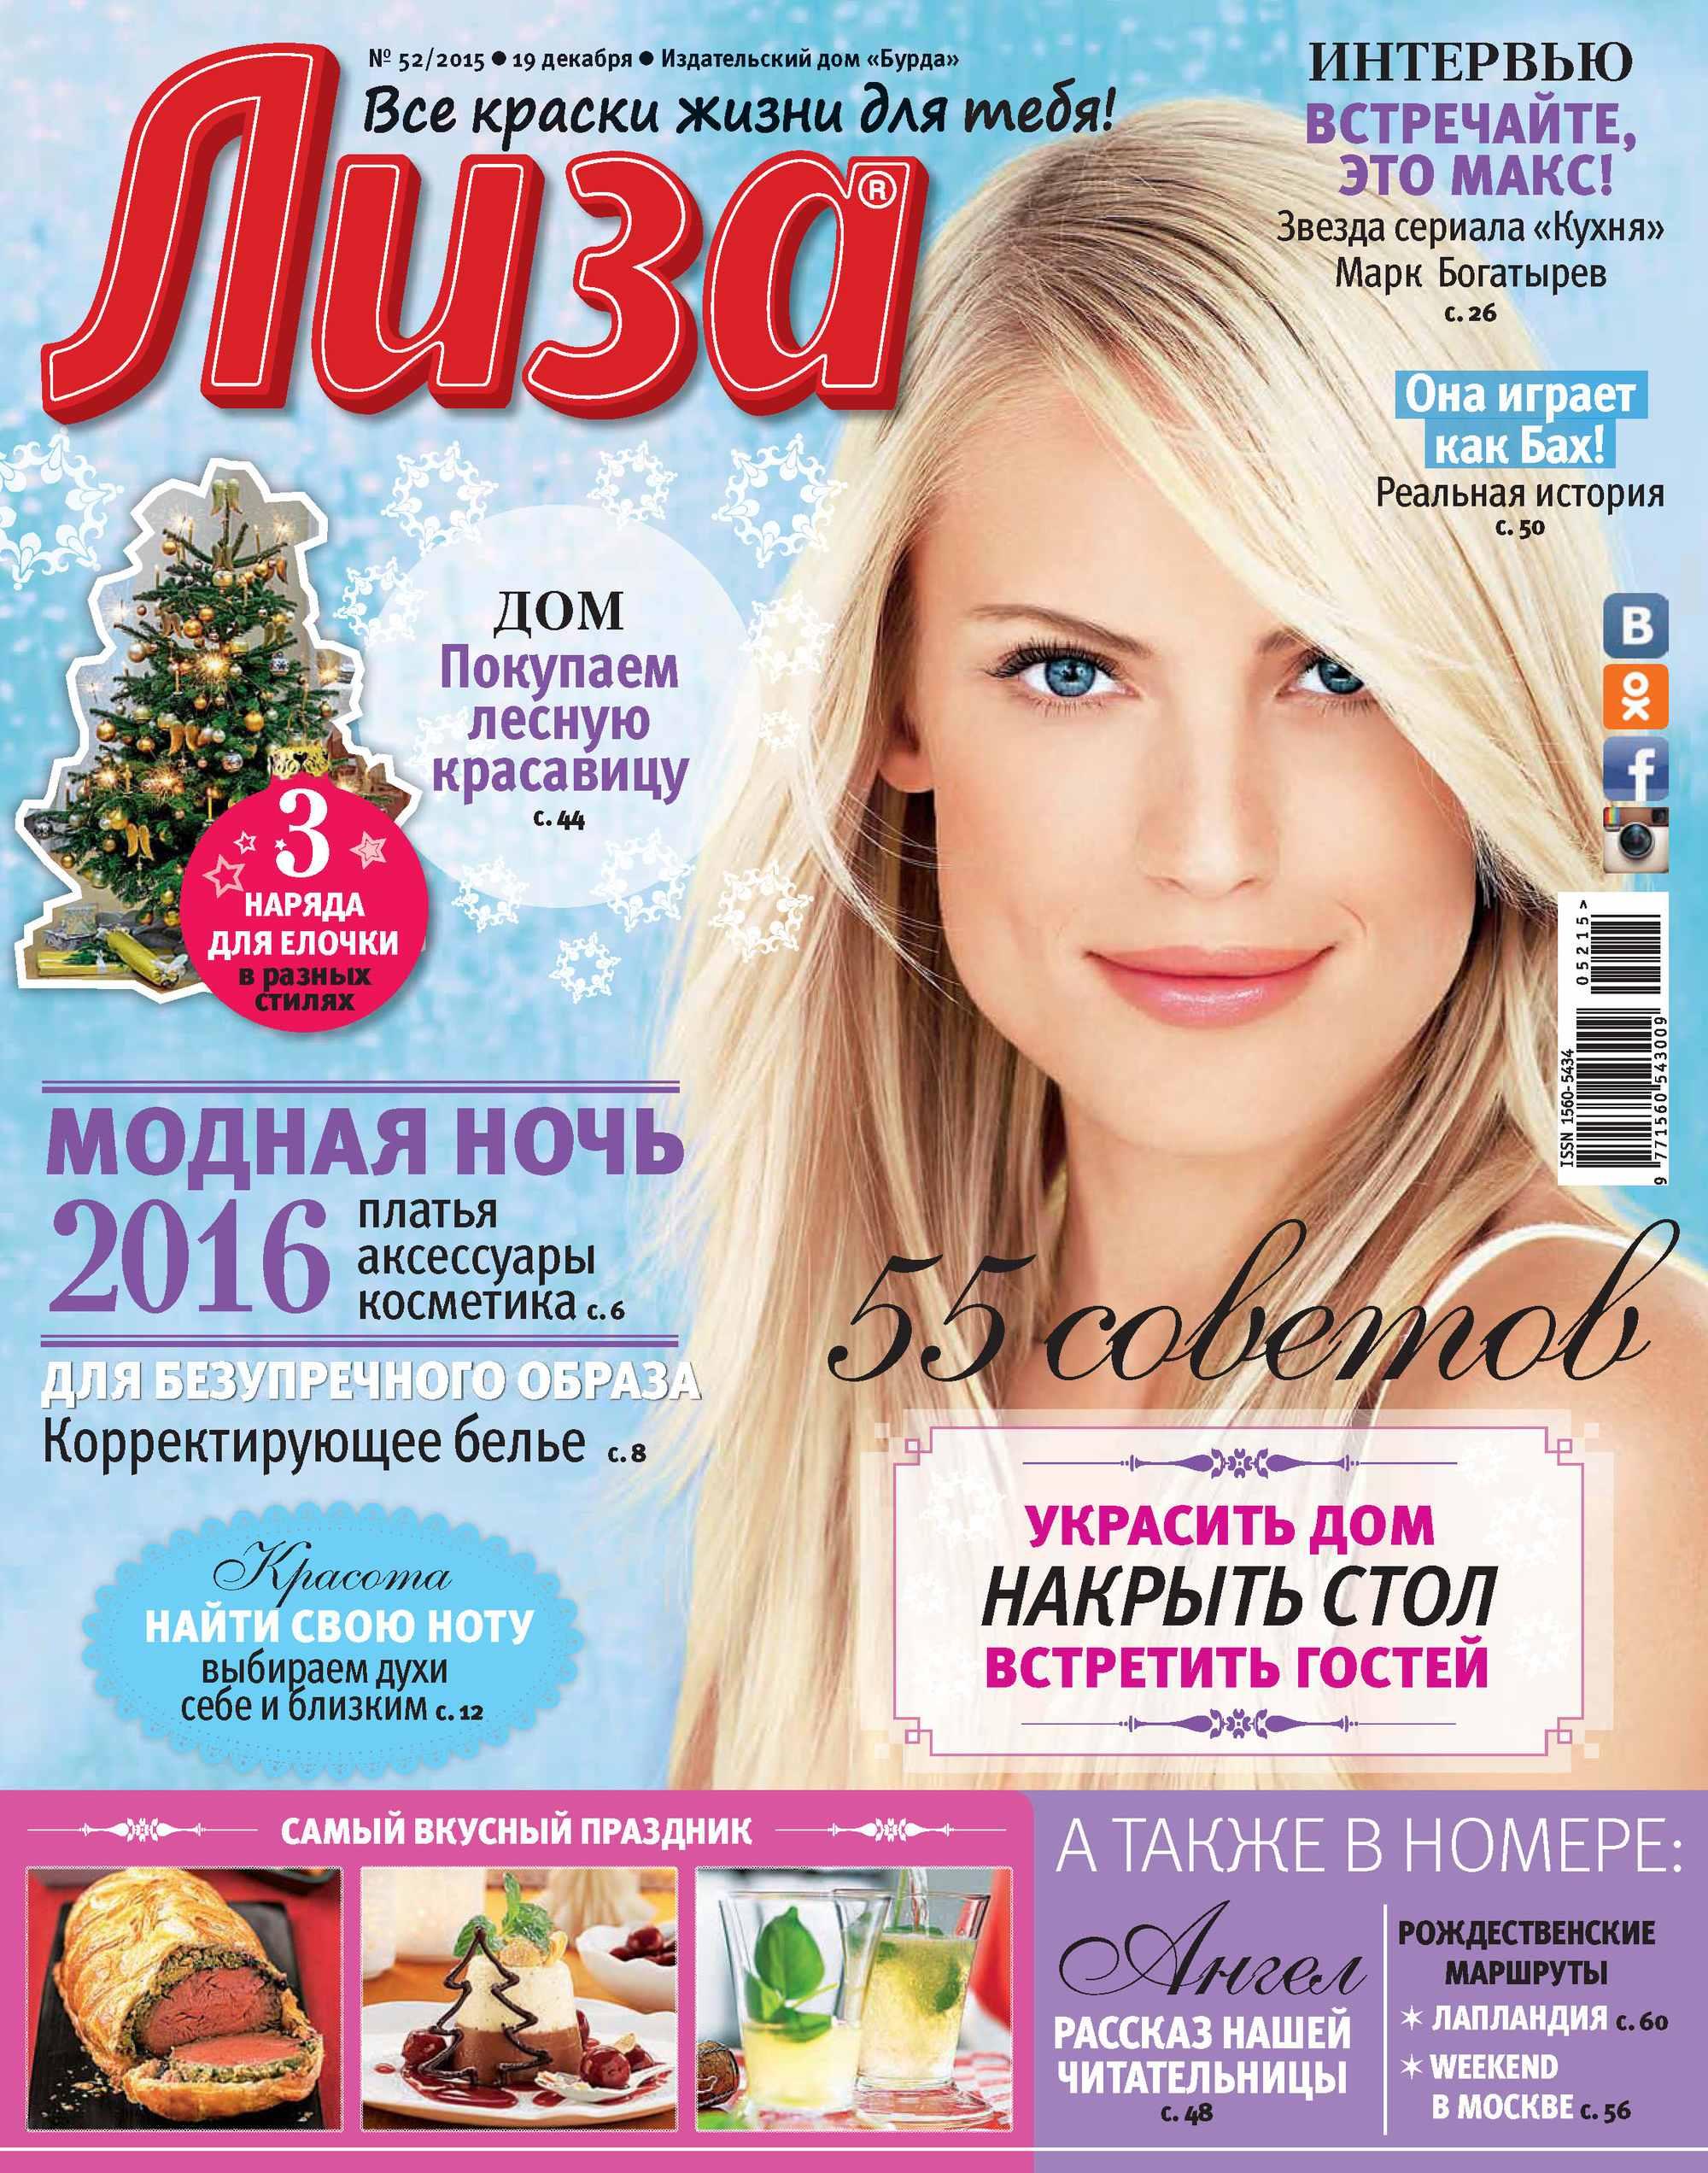 ИД «Бурда» Журнал «Лиза» №52/2015 ид бурда журнал лиза 13 2015